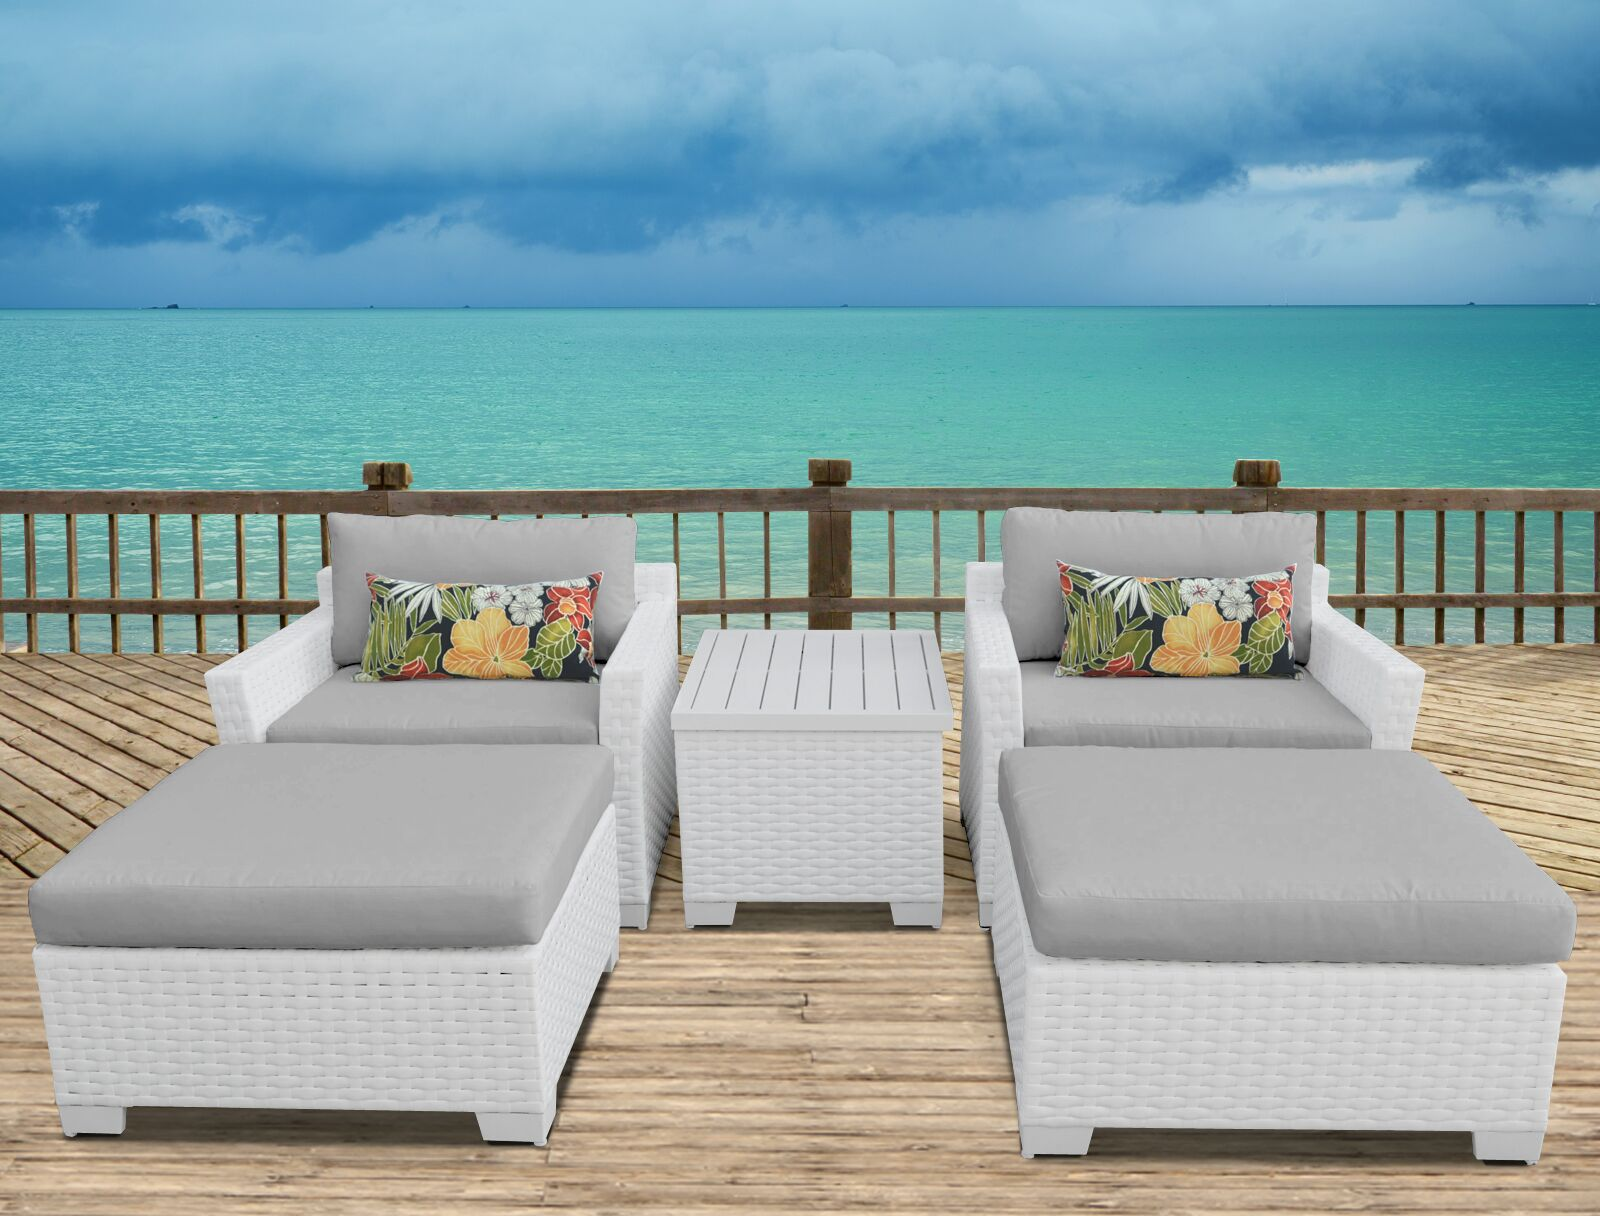 Monaco 5 Piece Conversation Set with Cushions Cushion Color (Fabric): Gray